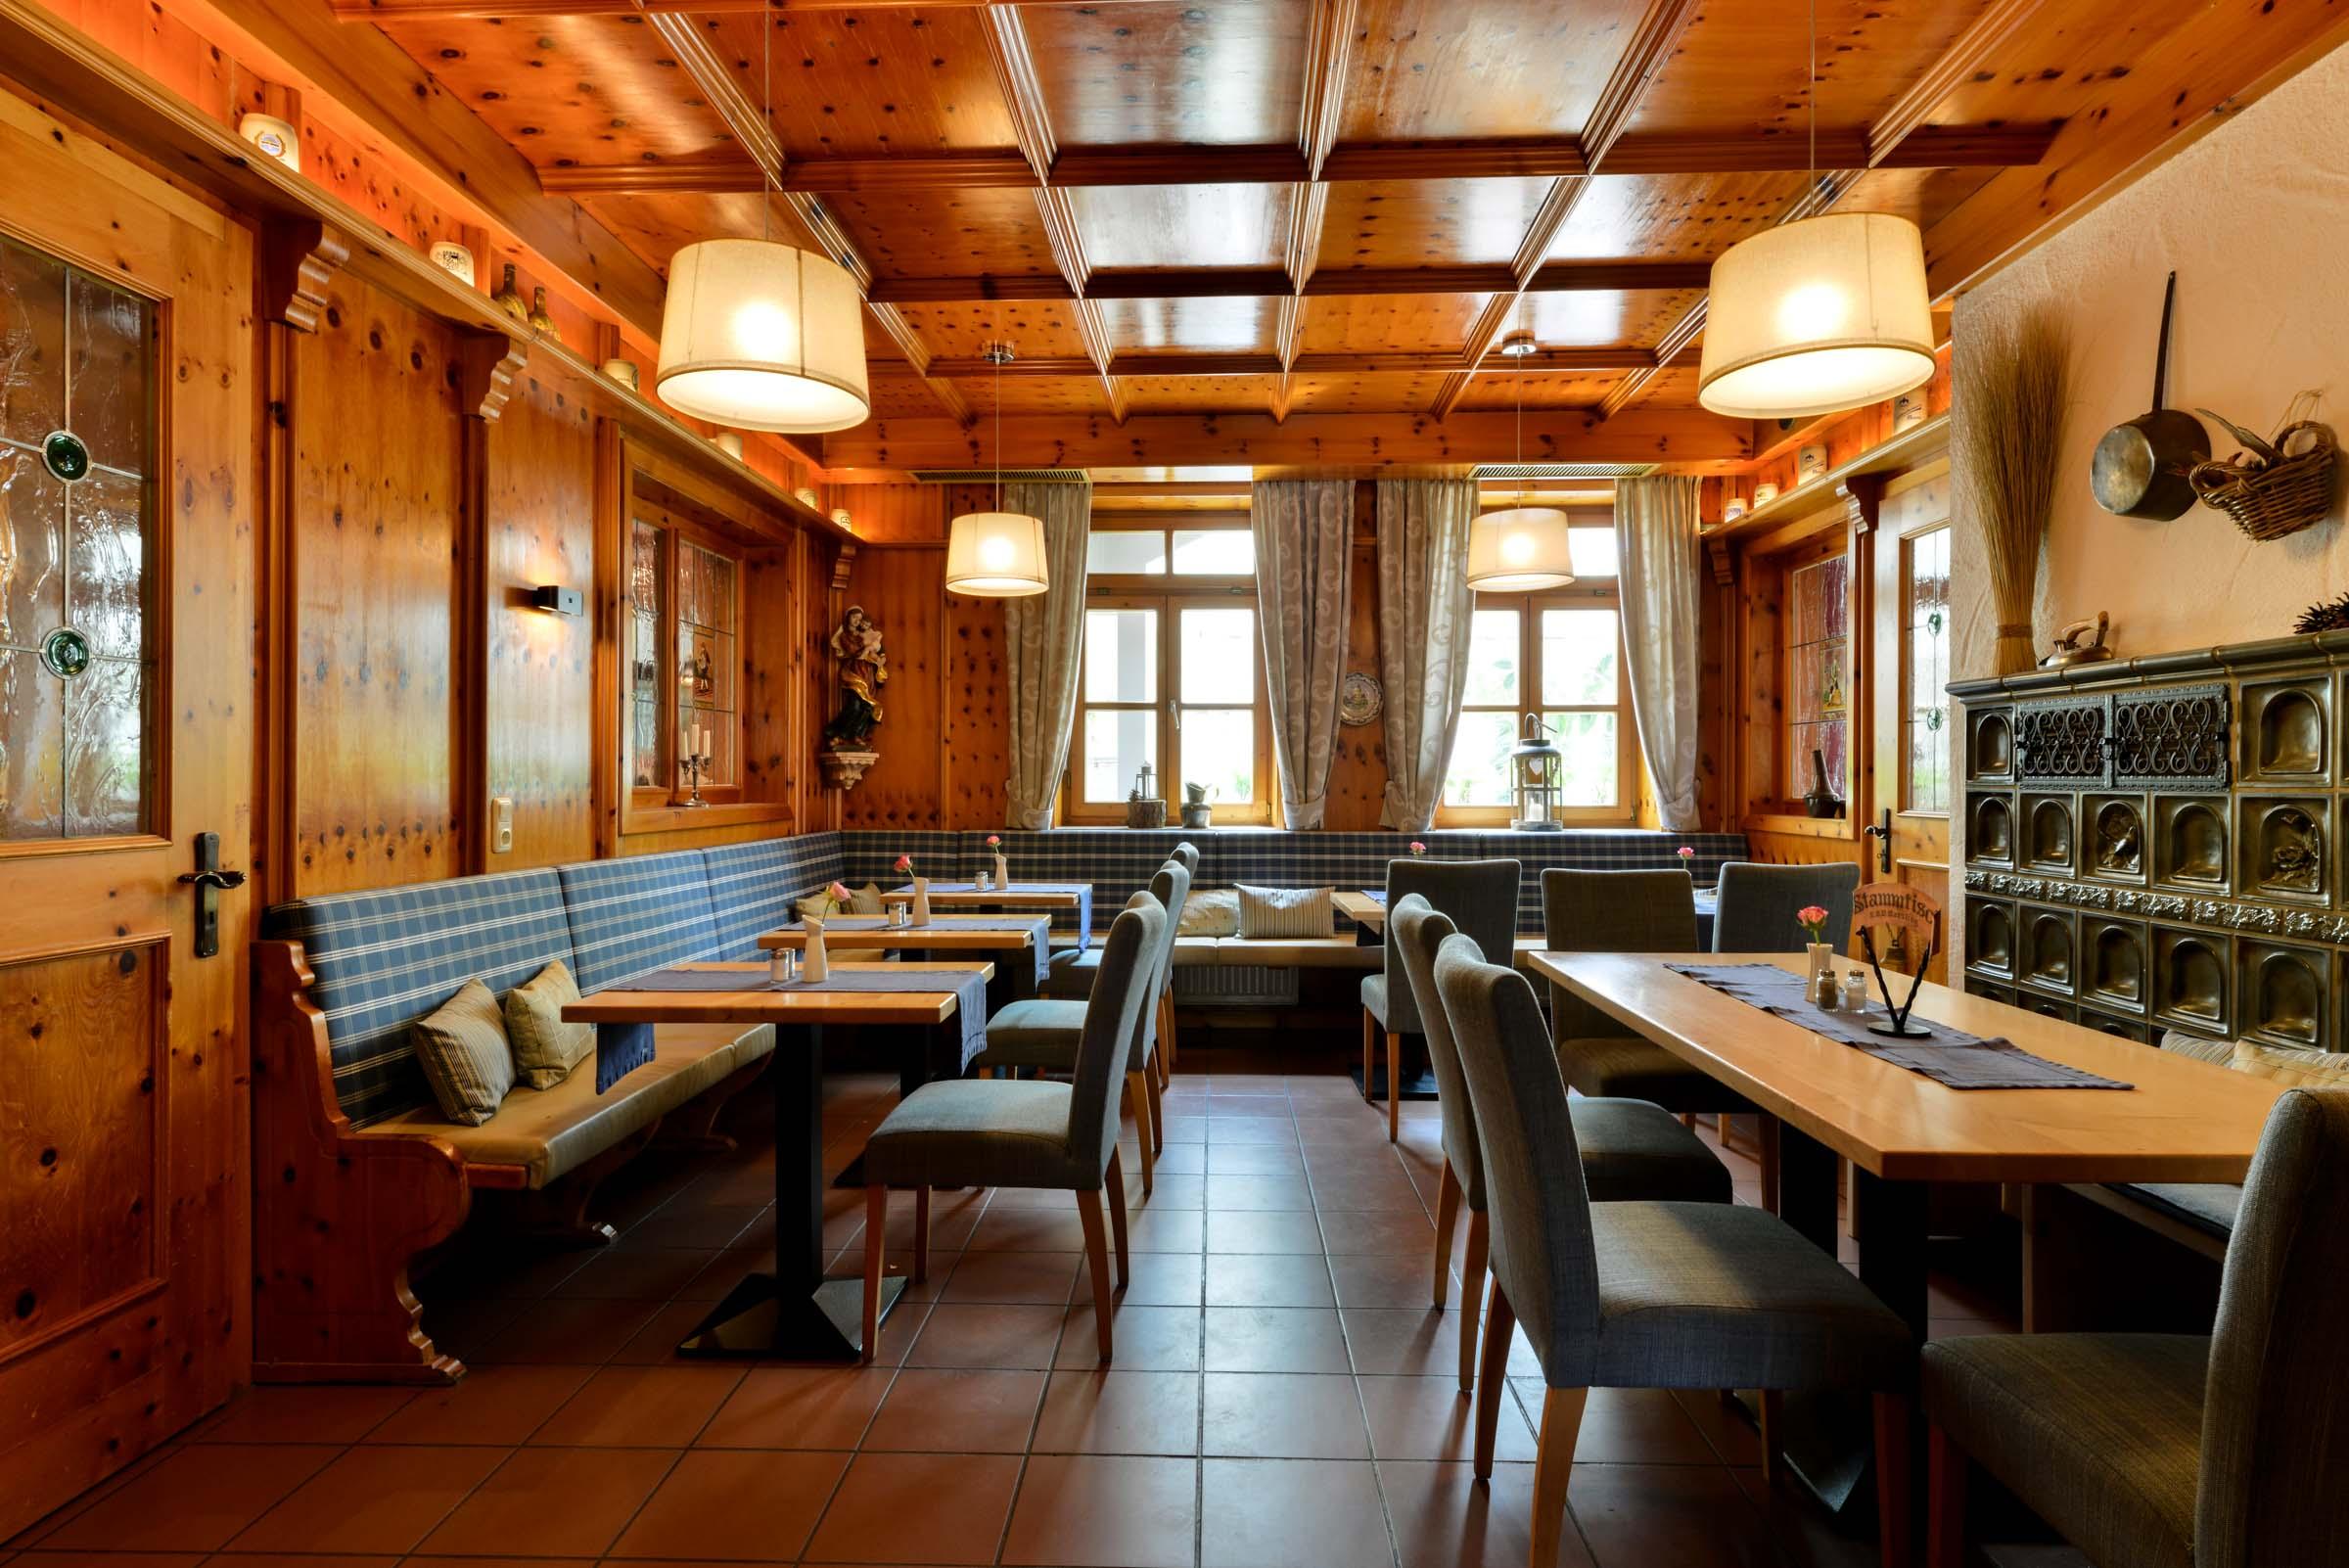 Hotel Nagerl Bavarian restaurant at Munich Airport